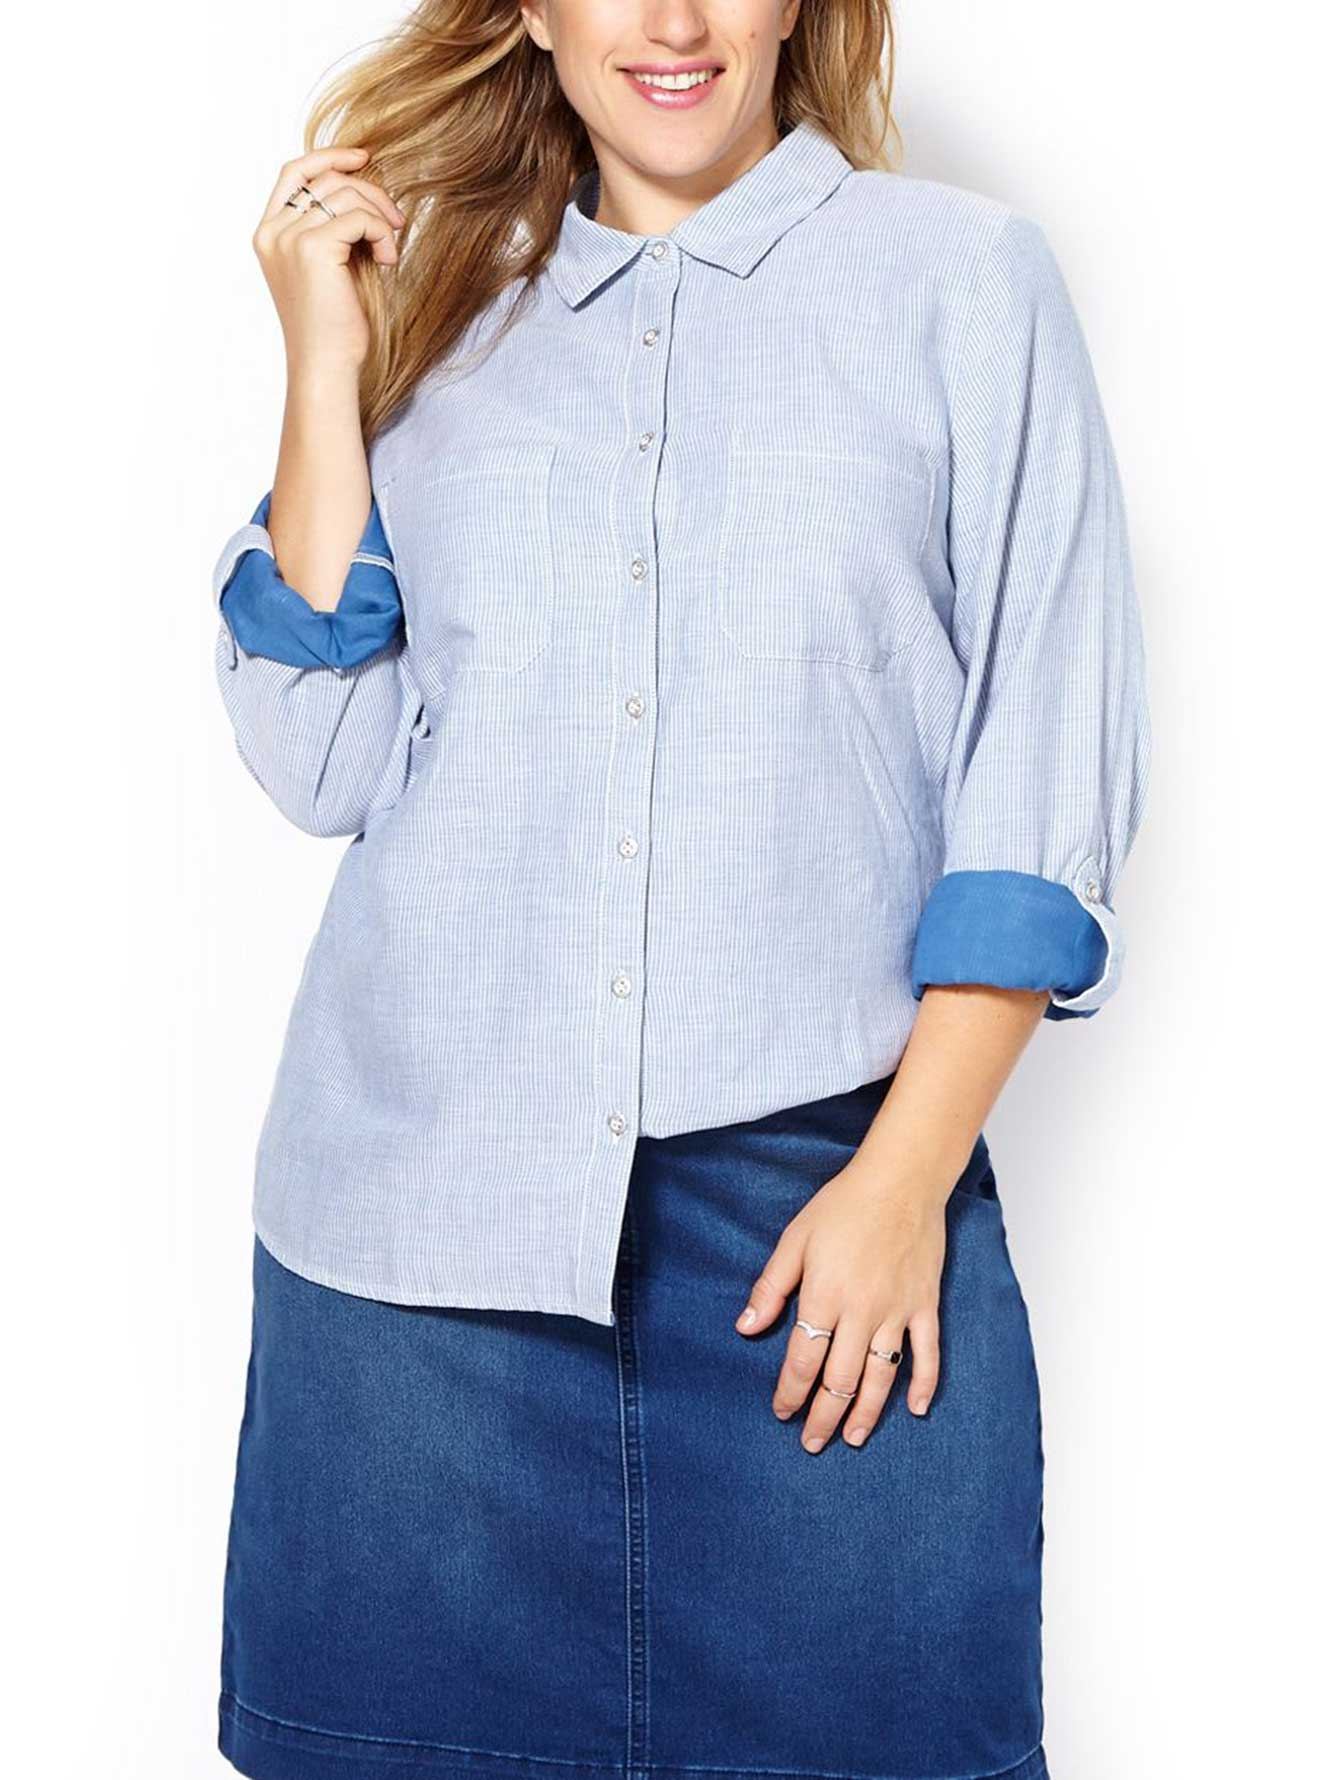 226d6db1ed7 d c JEANS Long Sleeve Button Up Cotton Shirt